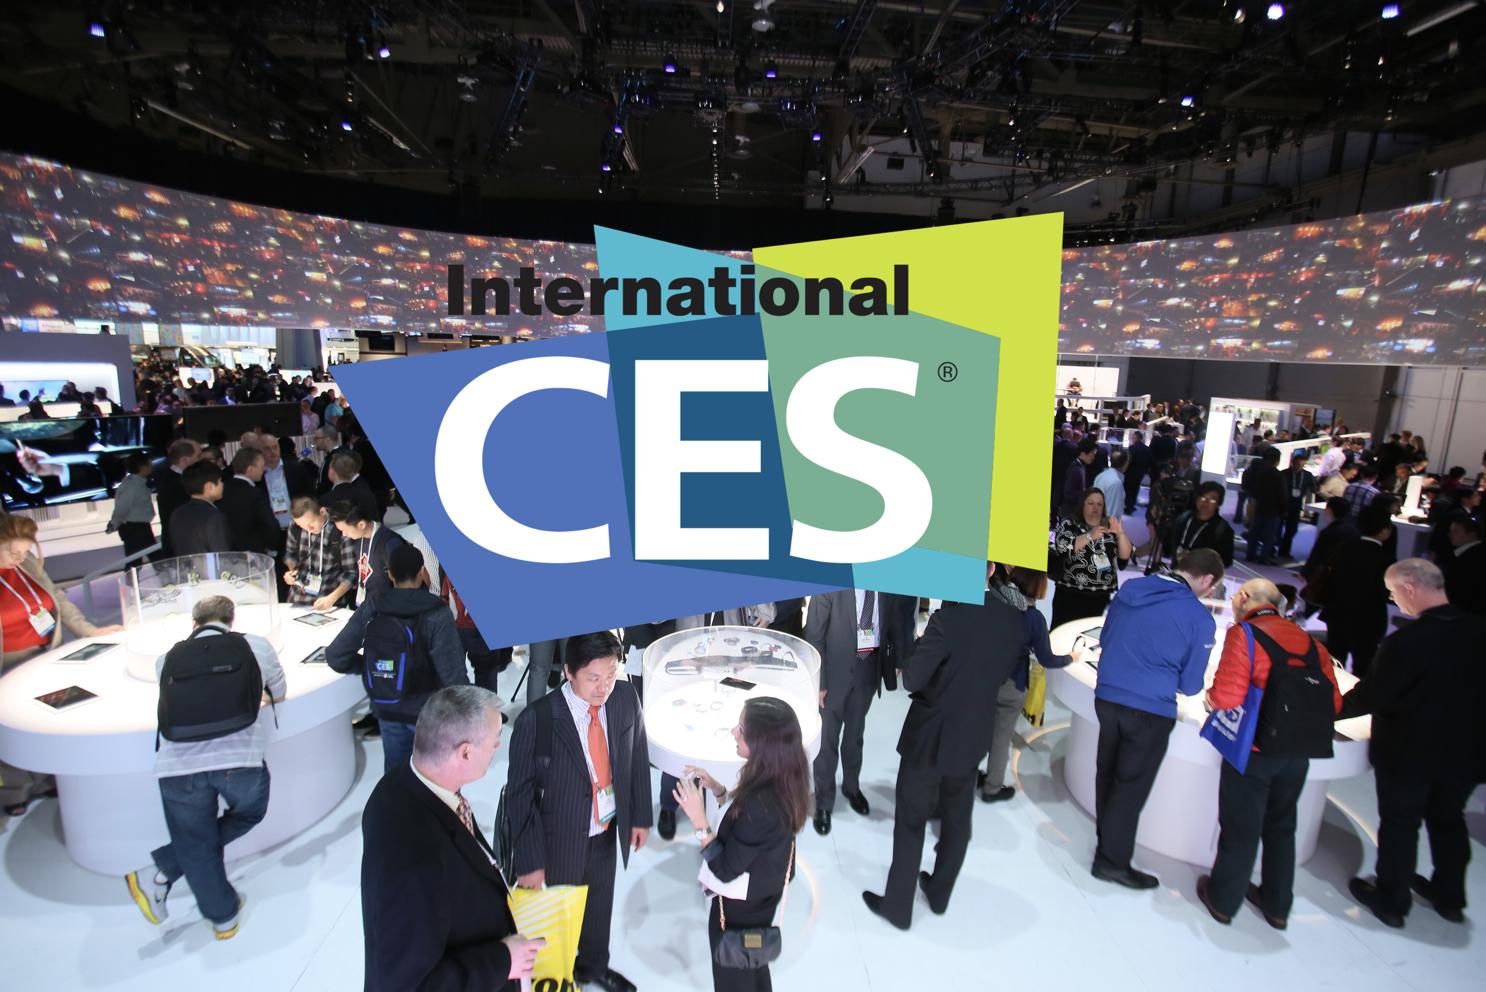 CES消费电子展览会